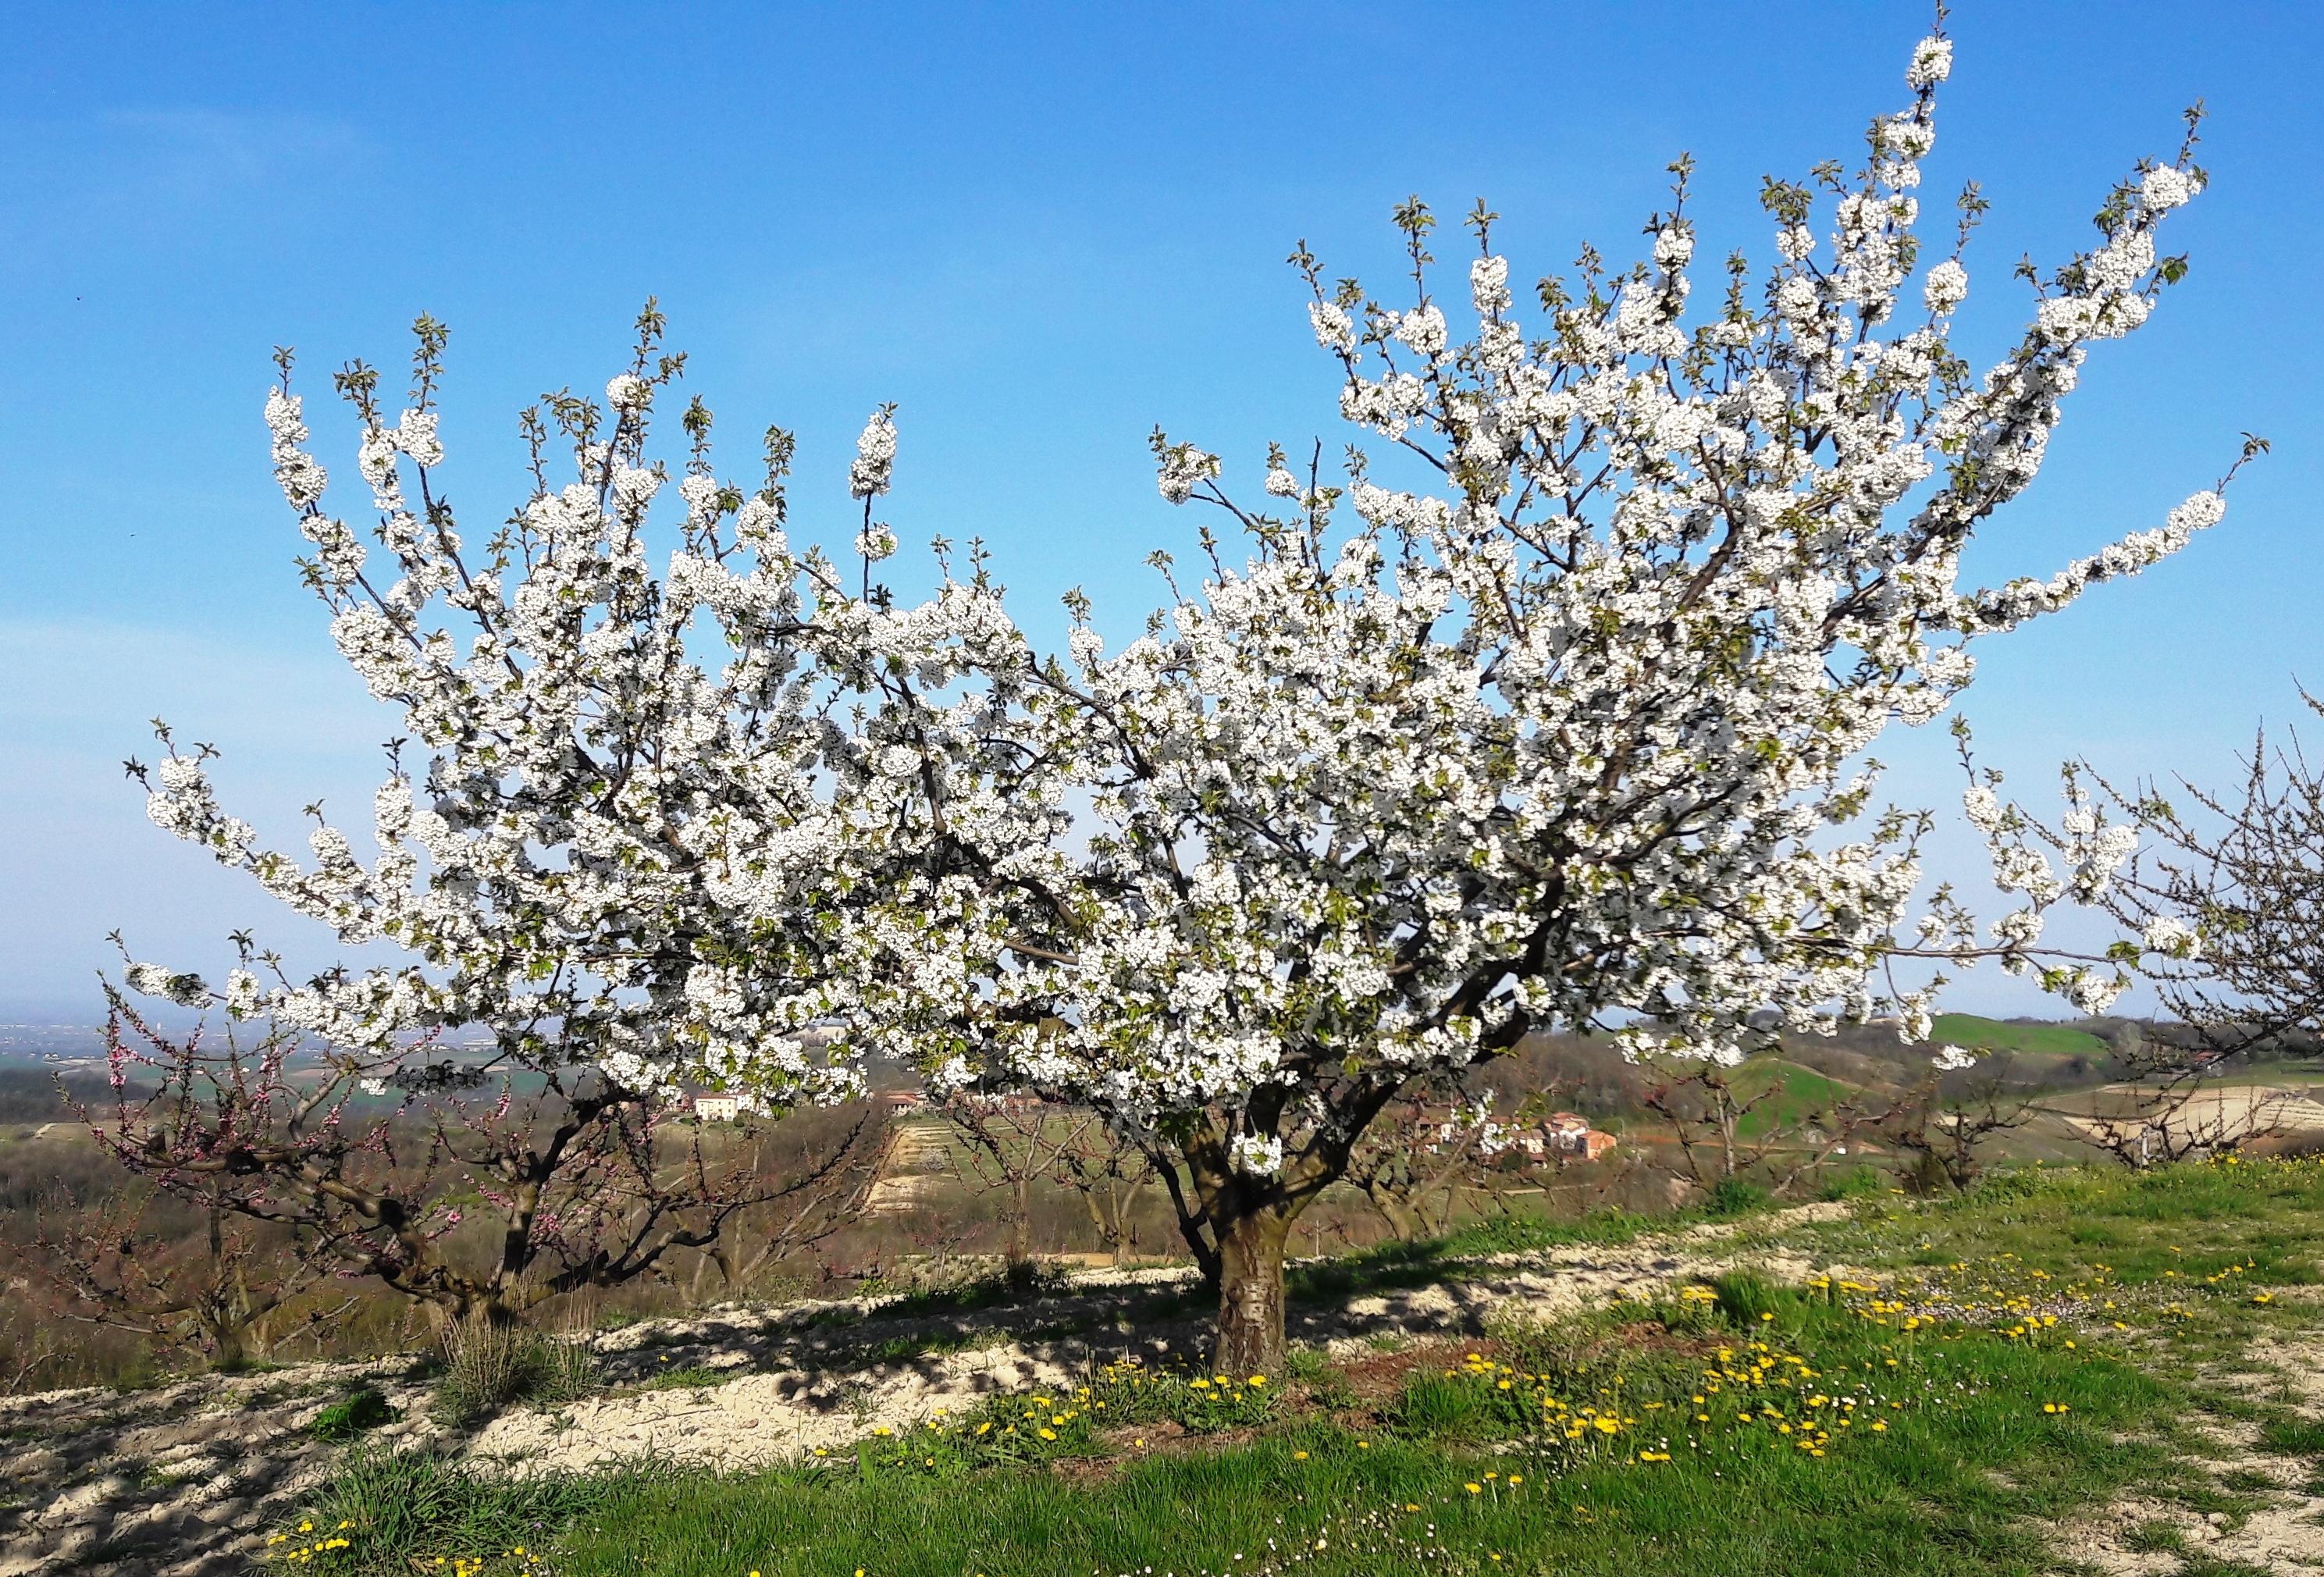 primavera a montemarzino